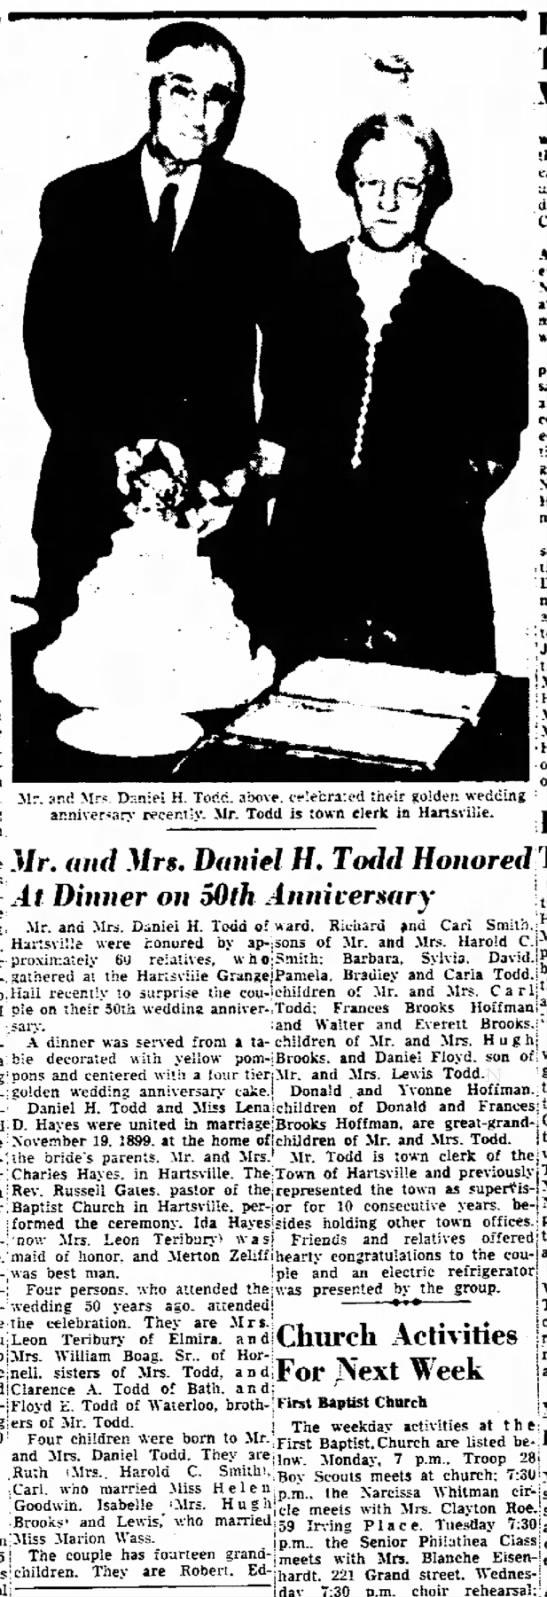 50th Anniversity Daniel H Todd and Lena Hayes Todd  26 Nov 1949 -